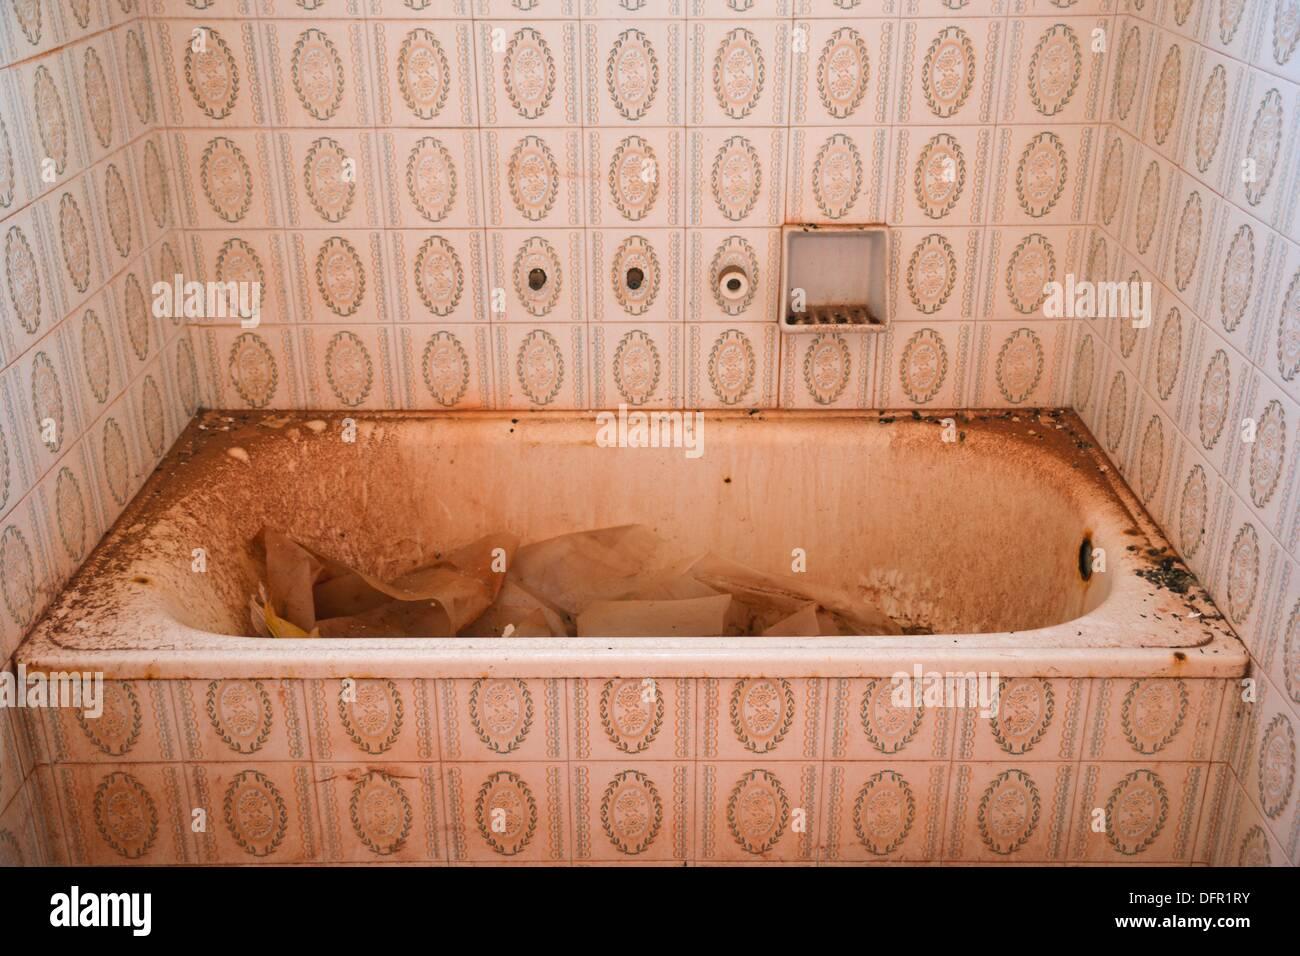 tub in disrepair, Menorca Balearic Islands Spain - Stock Image